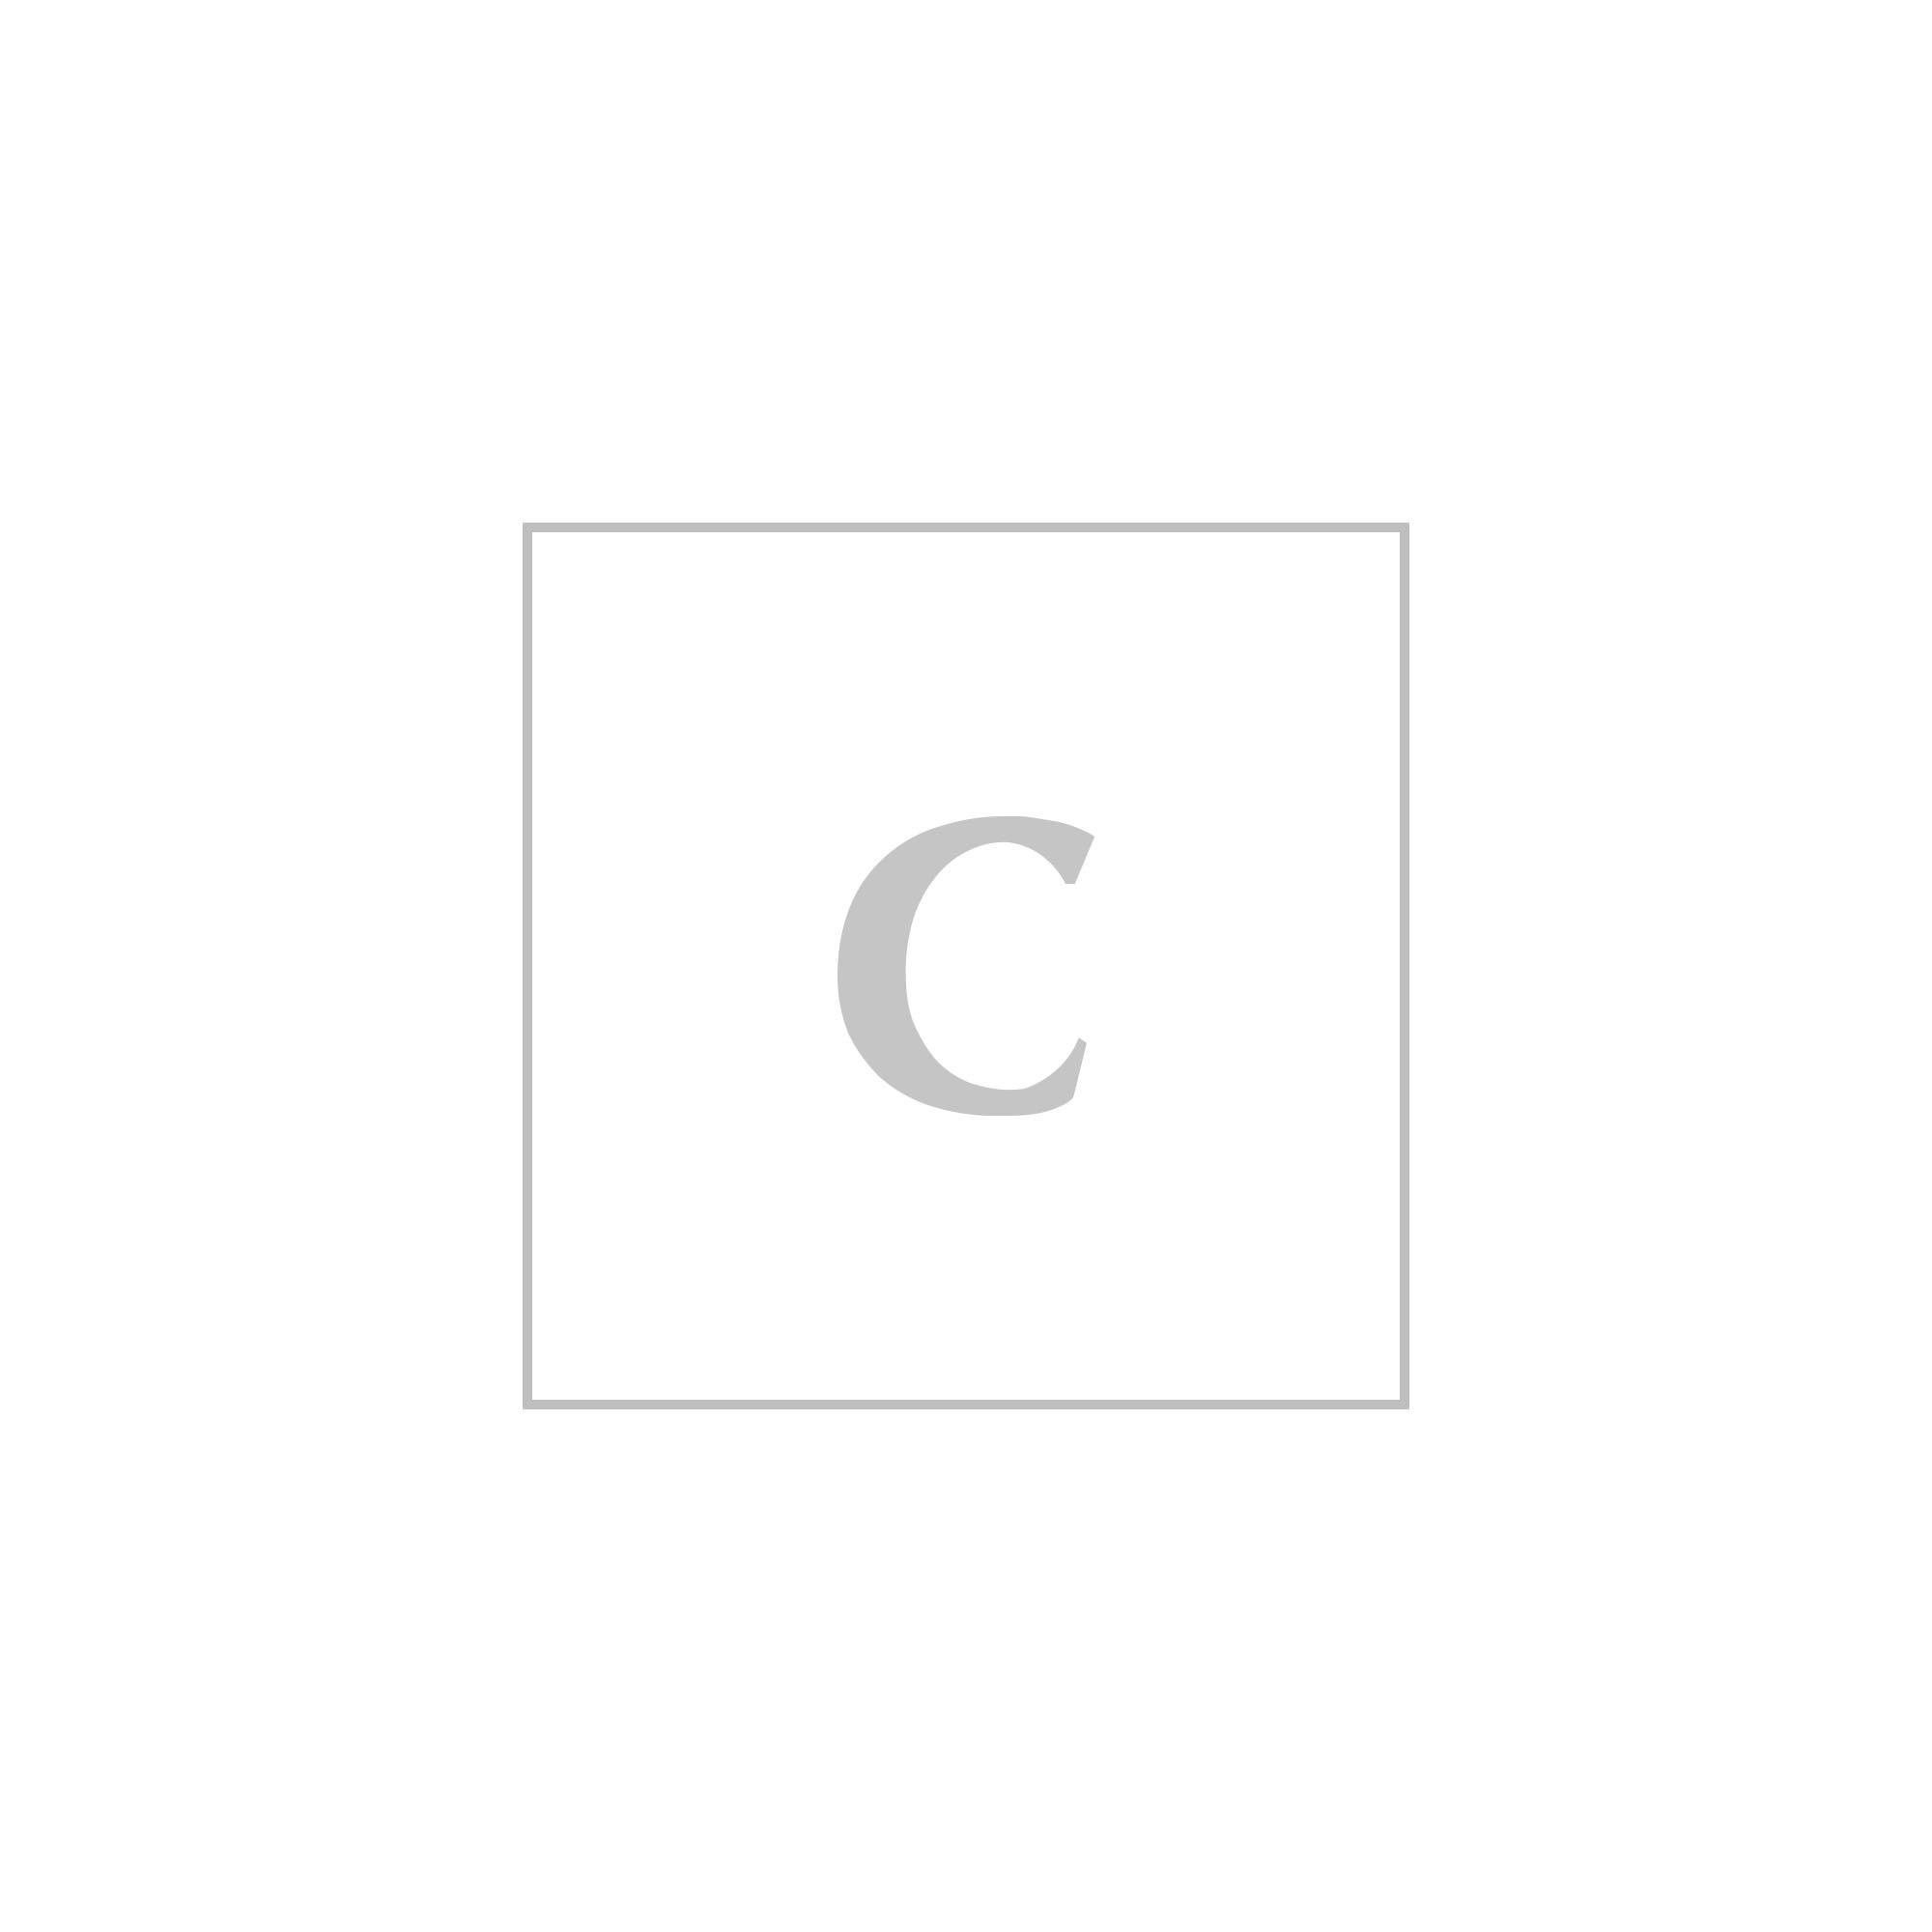 Lanvin calfskin card holder